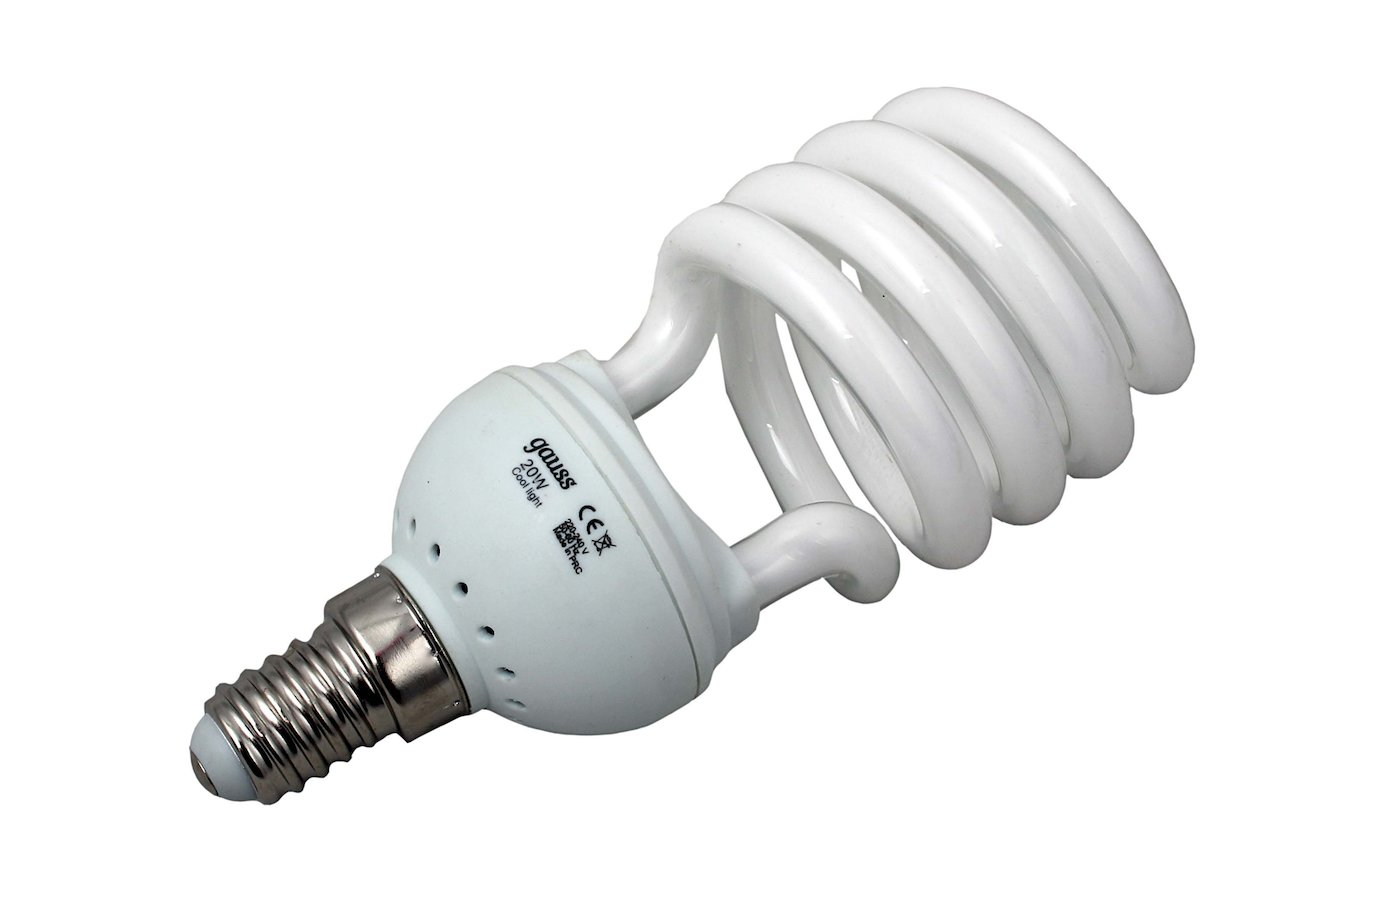 Лампочки энергосберегающие Gauss Spiral T2 20W 4200K E14